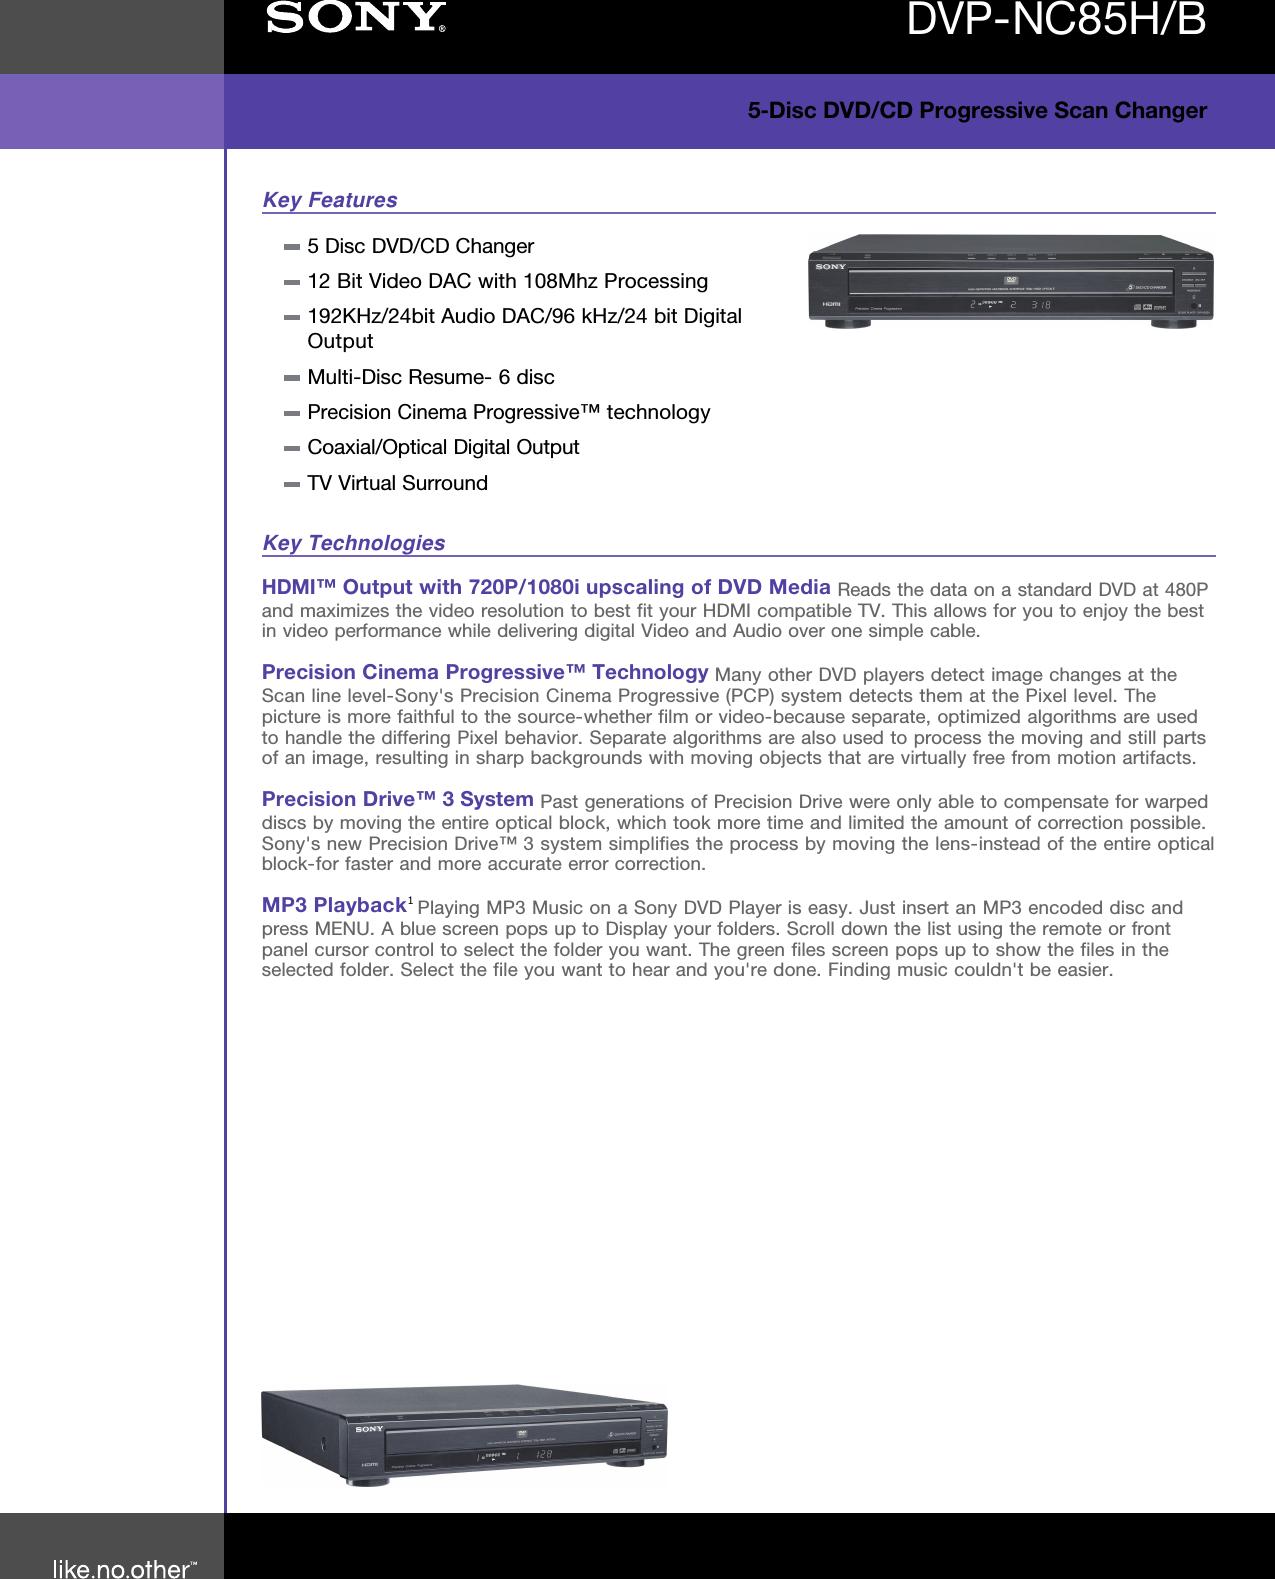 sony dvp nc85h user manual marketing specifications dvp nc85h b dvd rh usermanual wiki Sony CD Changer Sony 5 Disc DVD Player